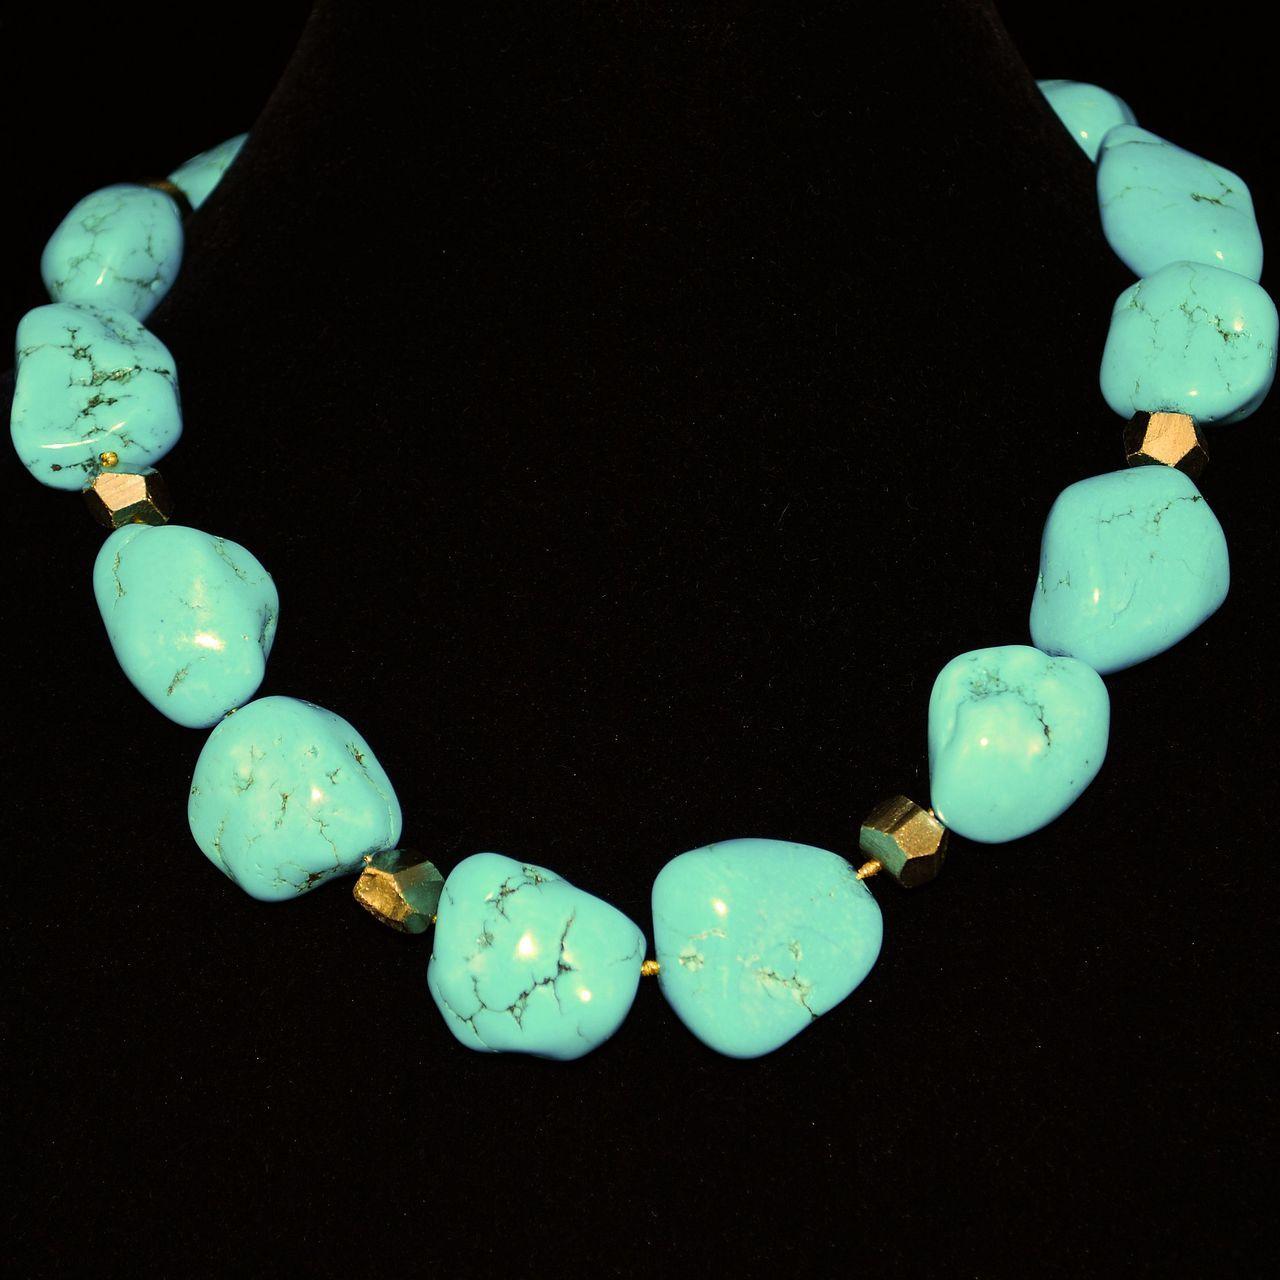 Enchanting Jewelry Creations image 66